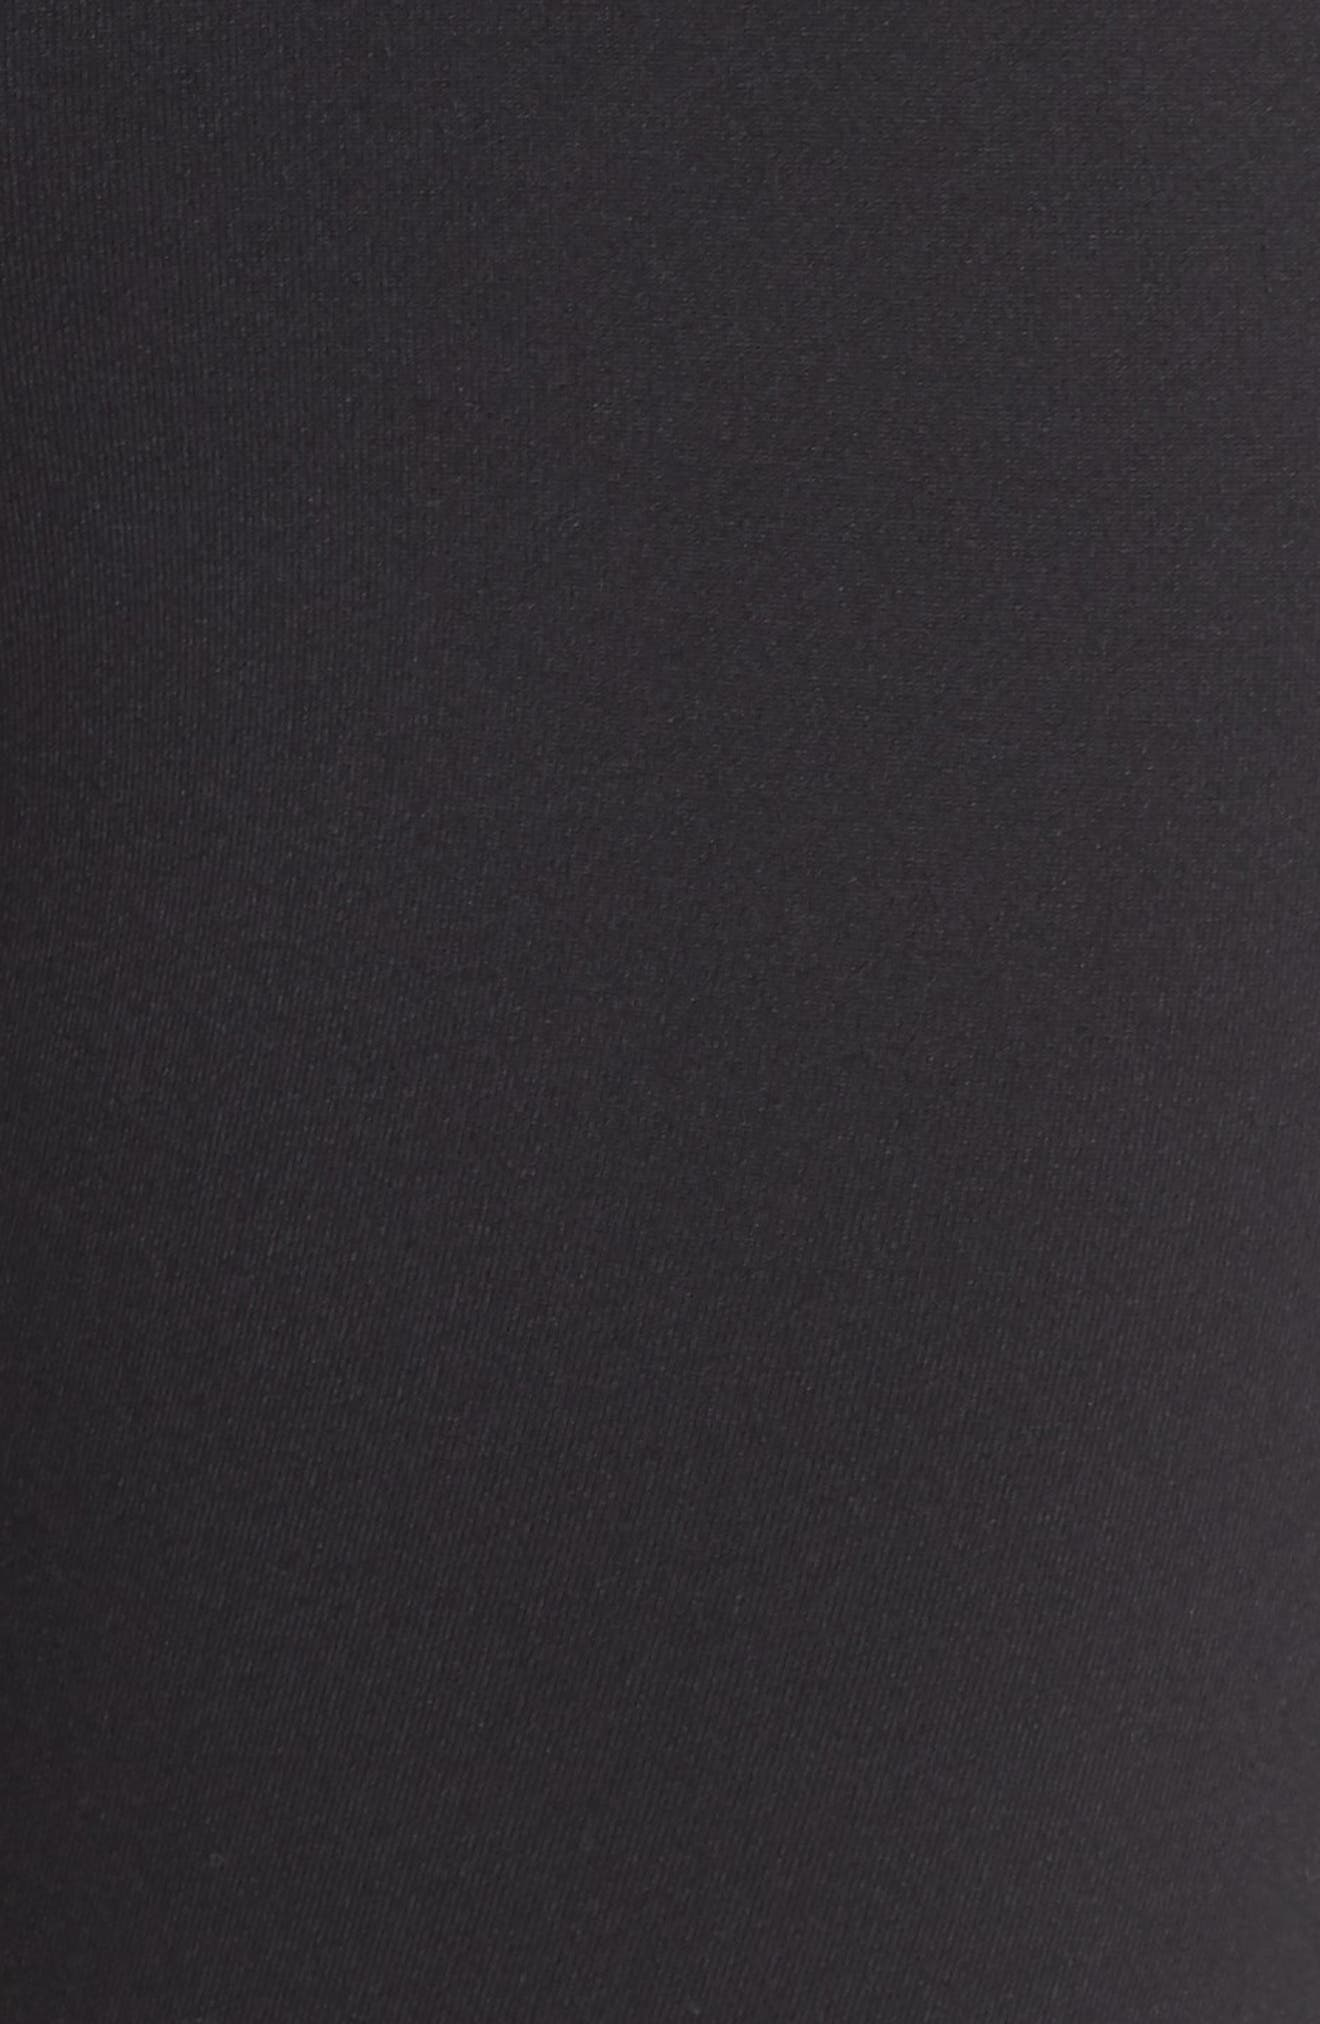 ZELLA, Hatha High Waist Bike Shorts, Alternate thumbnail 6, color, BLACK